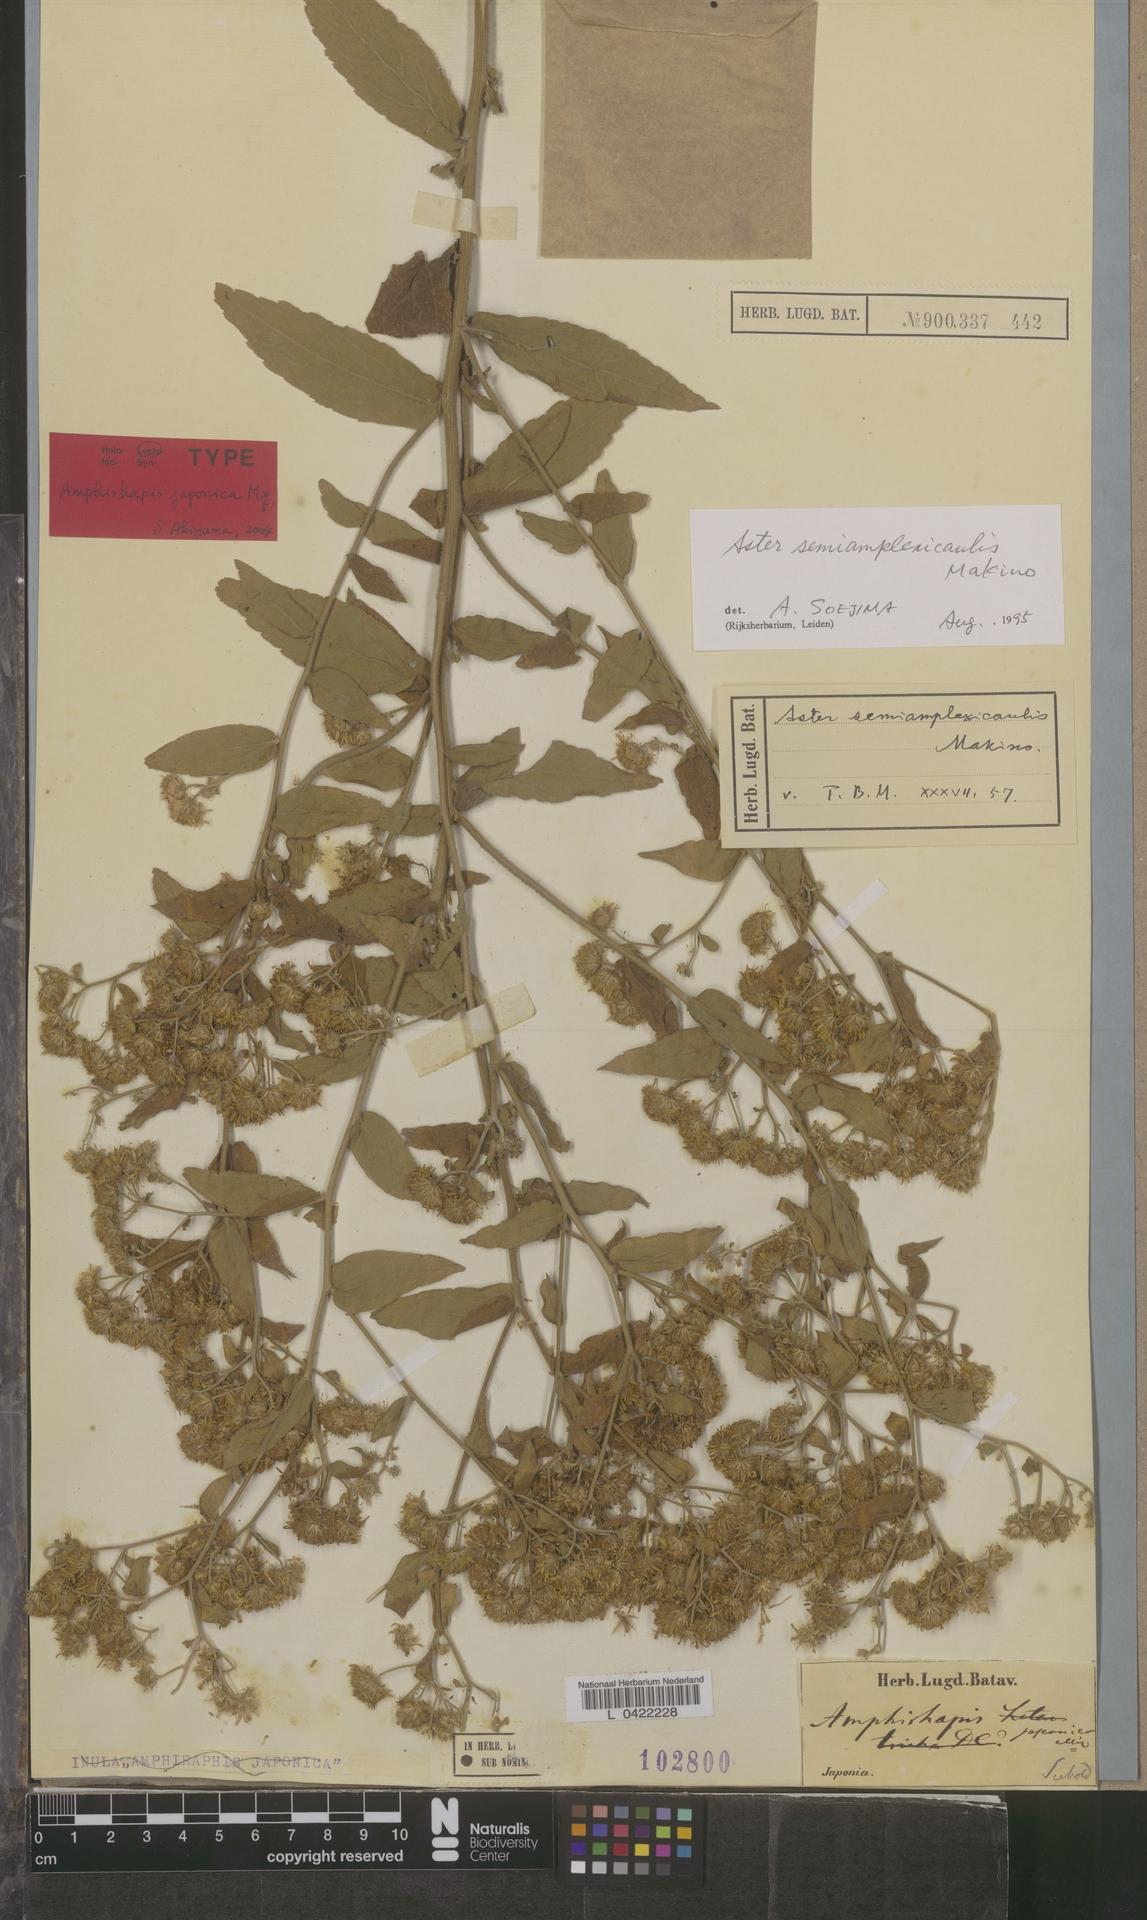 L  0422228   Aster semiamplexicaulis Makino